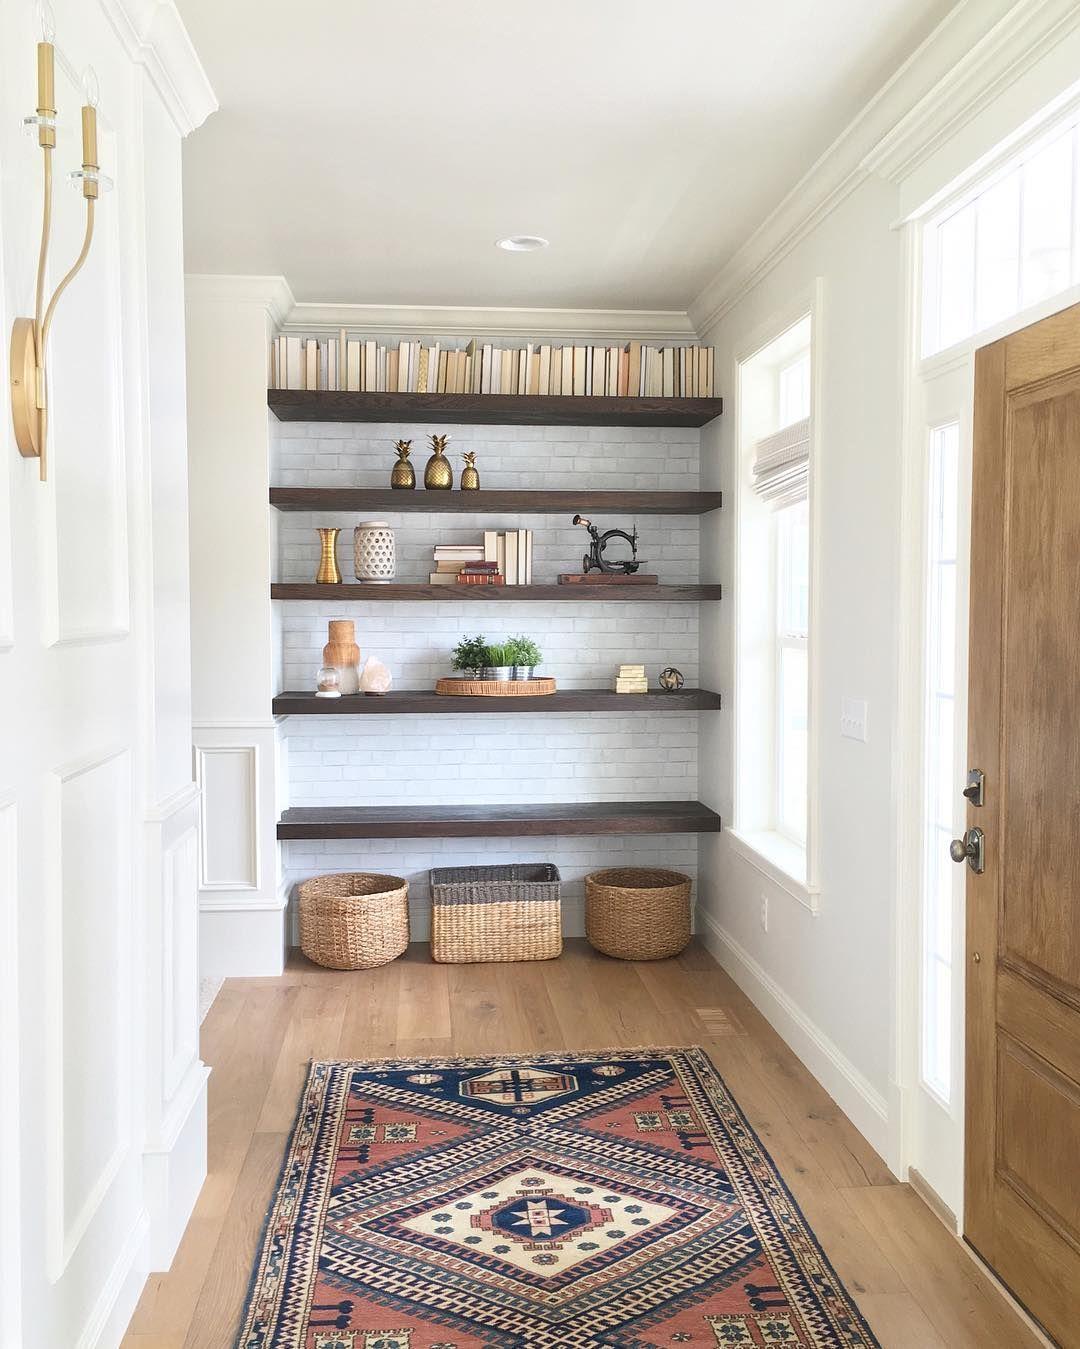 Best 25 Tiled Hallway Ideas On Pinterest: Best 25+ Hallway Shelving Ideas On Pinterest